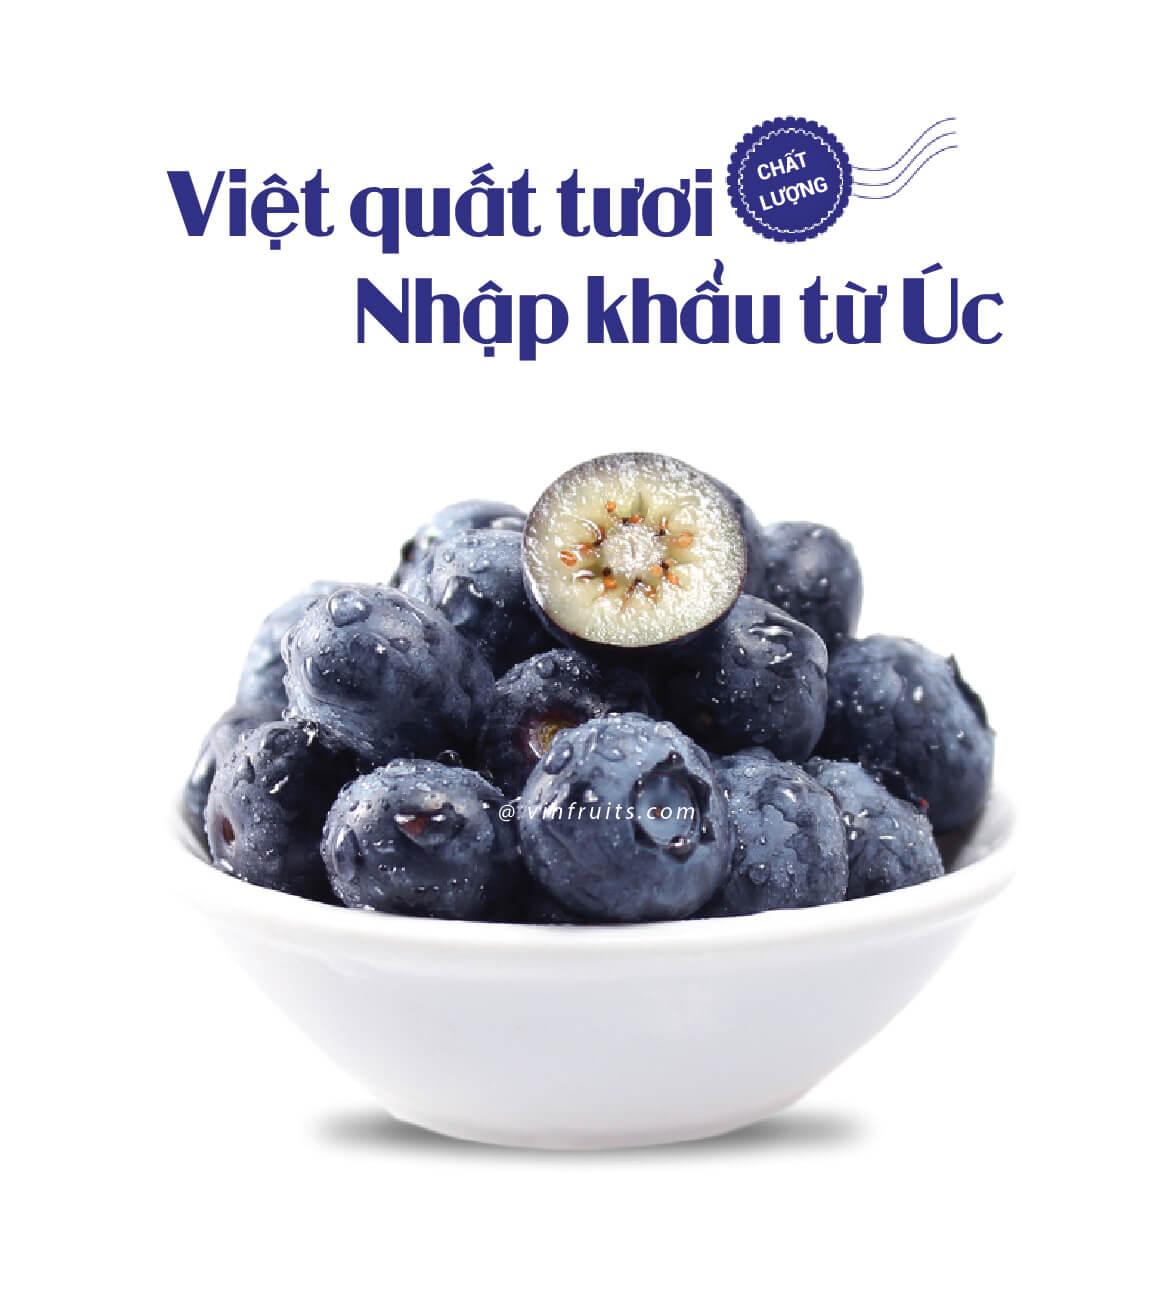 Viet quat tuoi Uc - vinfruits.com 1